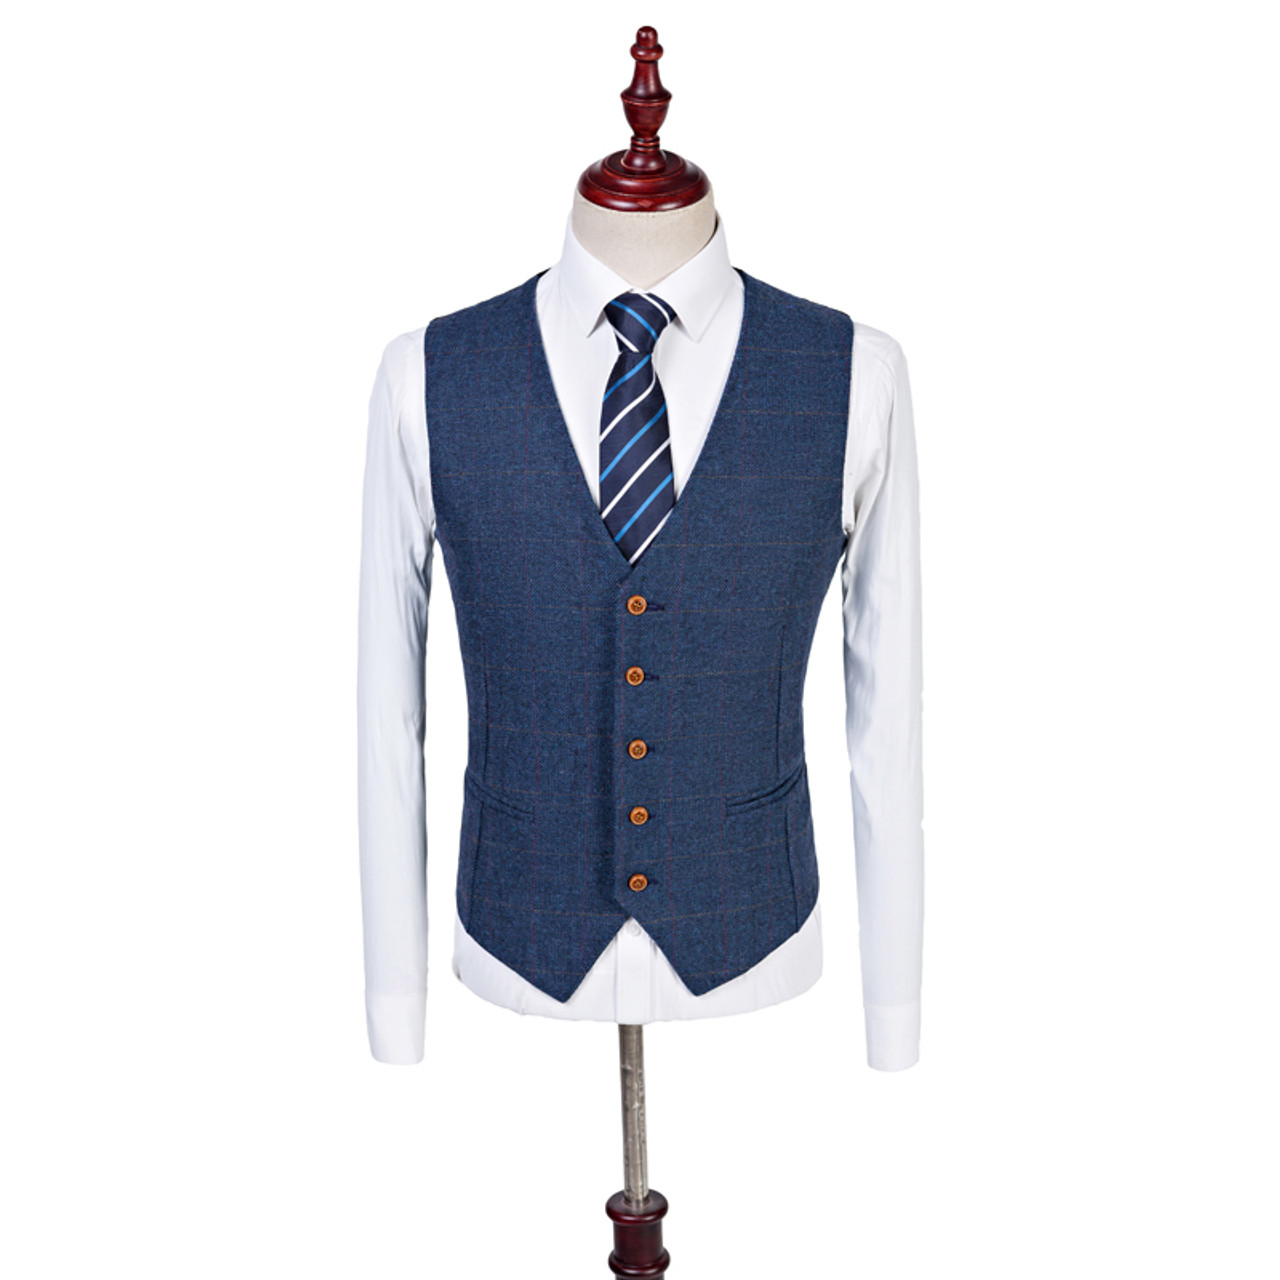 b8faca8bb6 ... Latest Coat Pant Design Custom Made Wool Blue Herringbone Retro  gentleman Style Men Wedding Suits Tailor ...